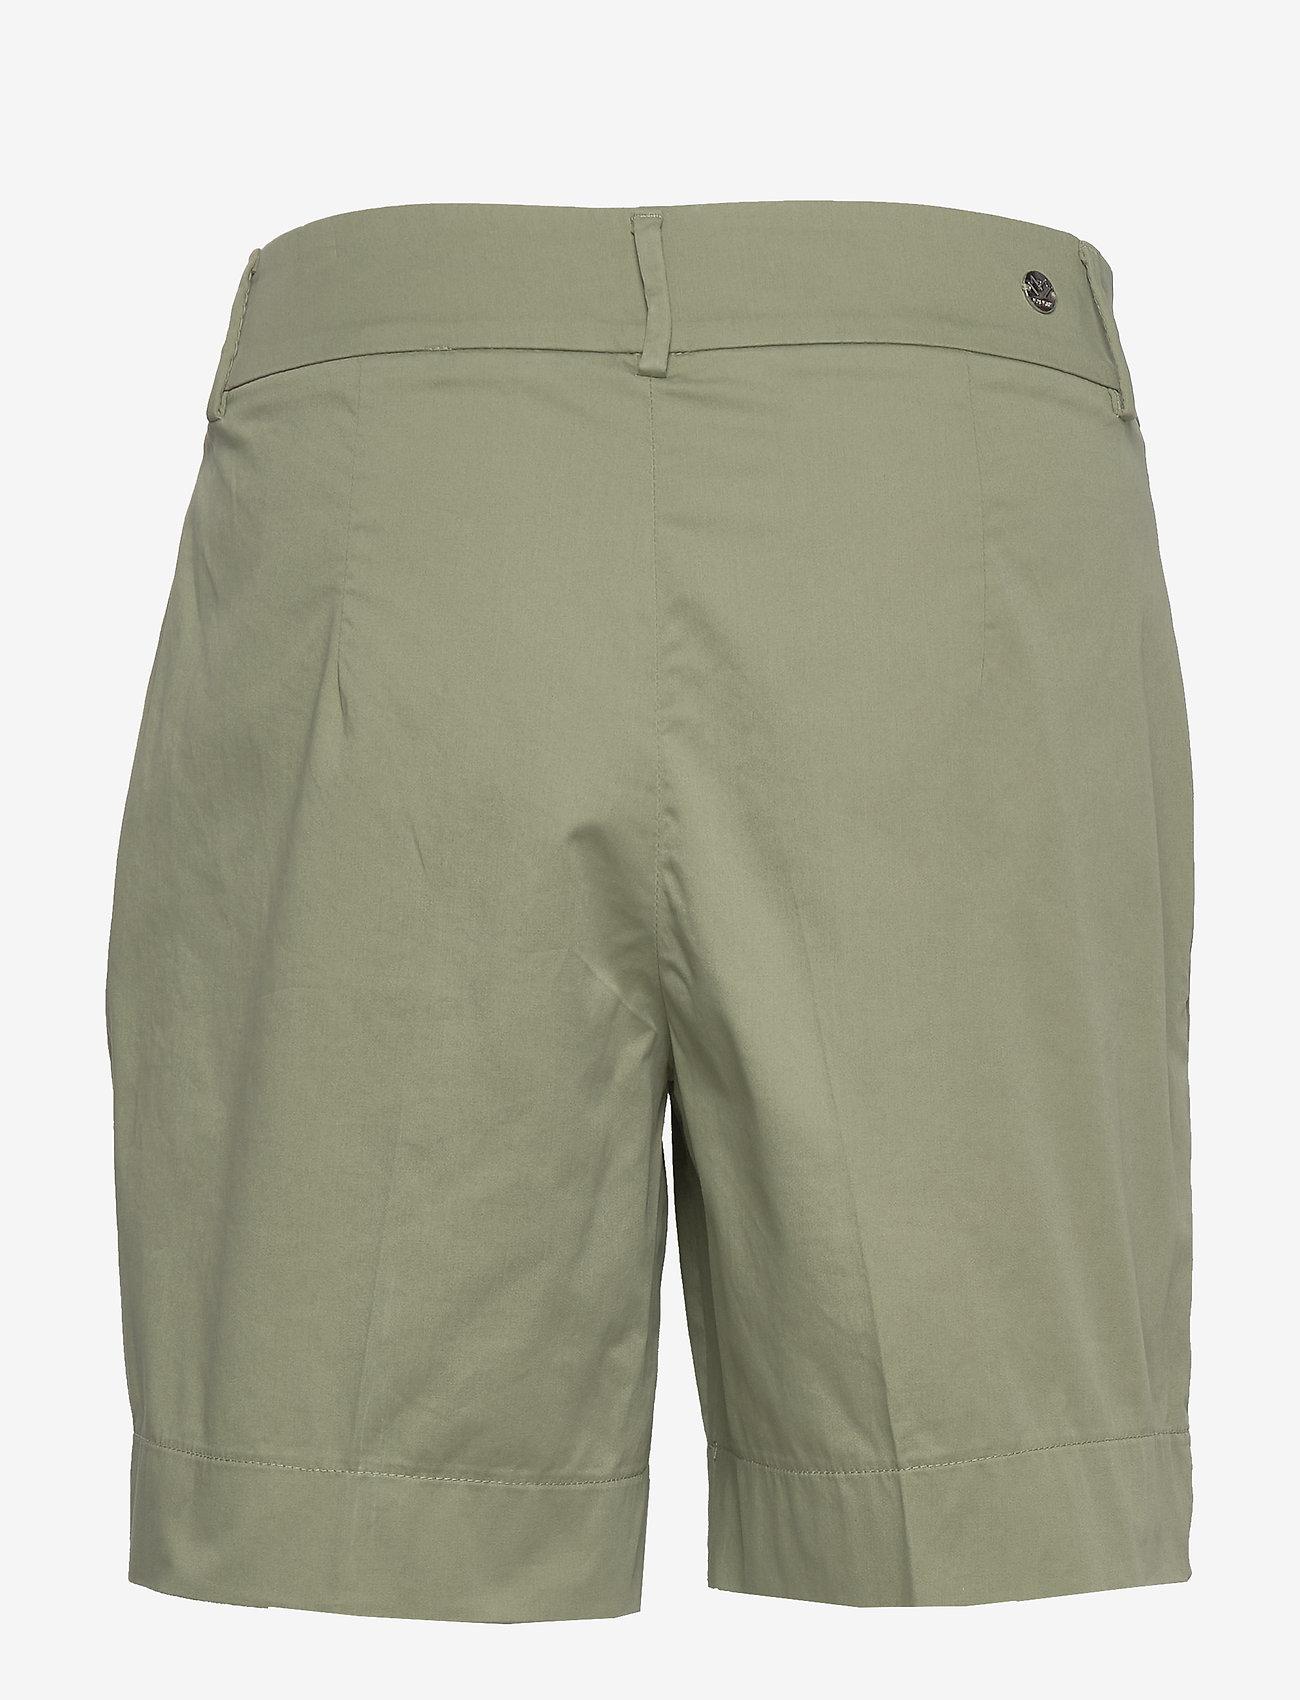 Mika Cole Shorts (Oil Green) (89 €) - MOS MOSH hYKXY